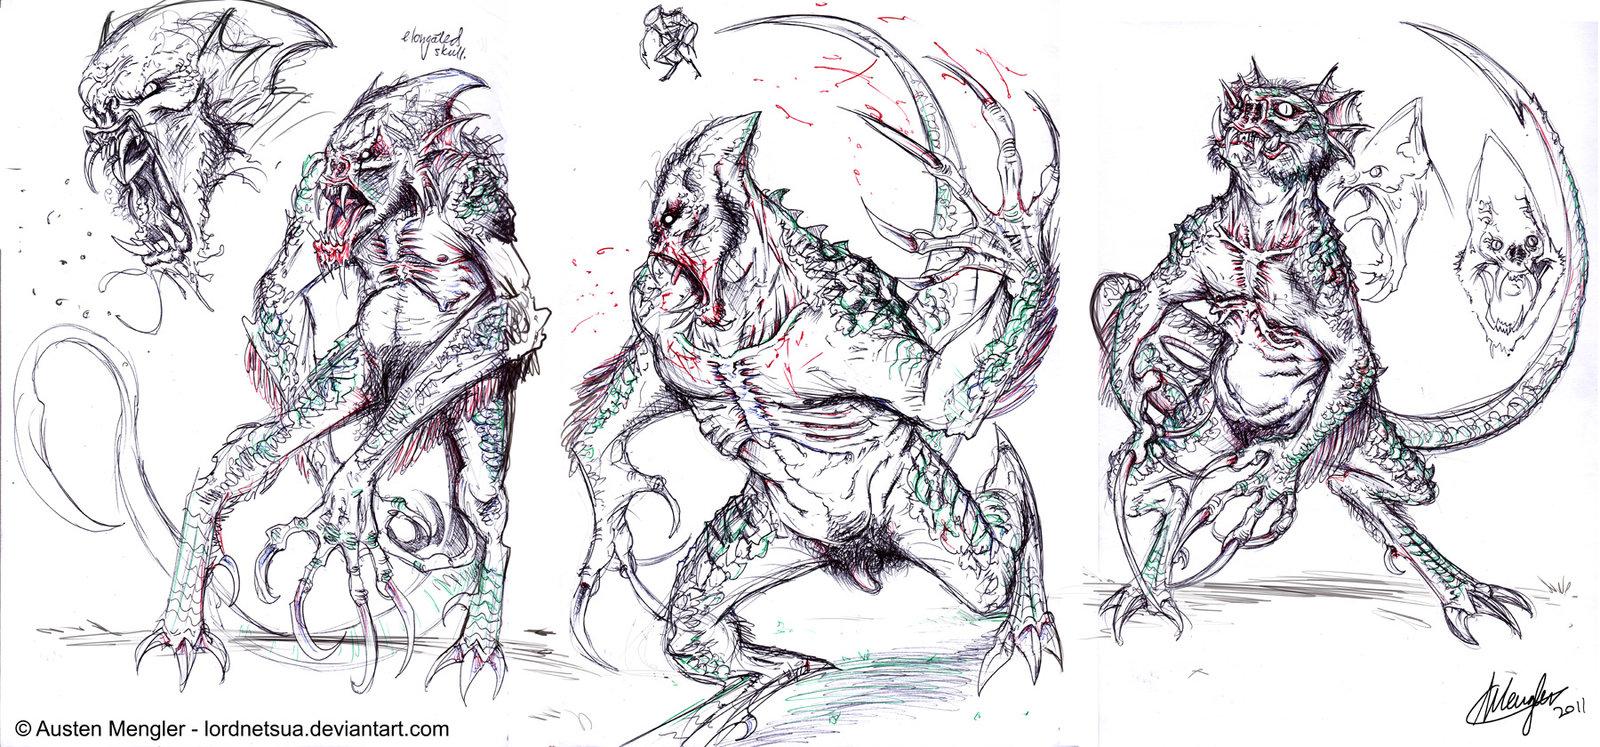 creature_design__concepts_4_6_by_lordnetsua-d5cyaes.jpg